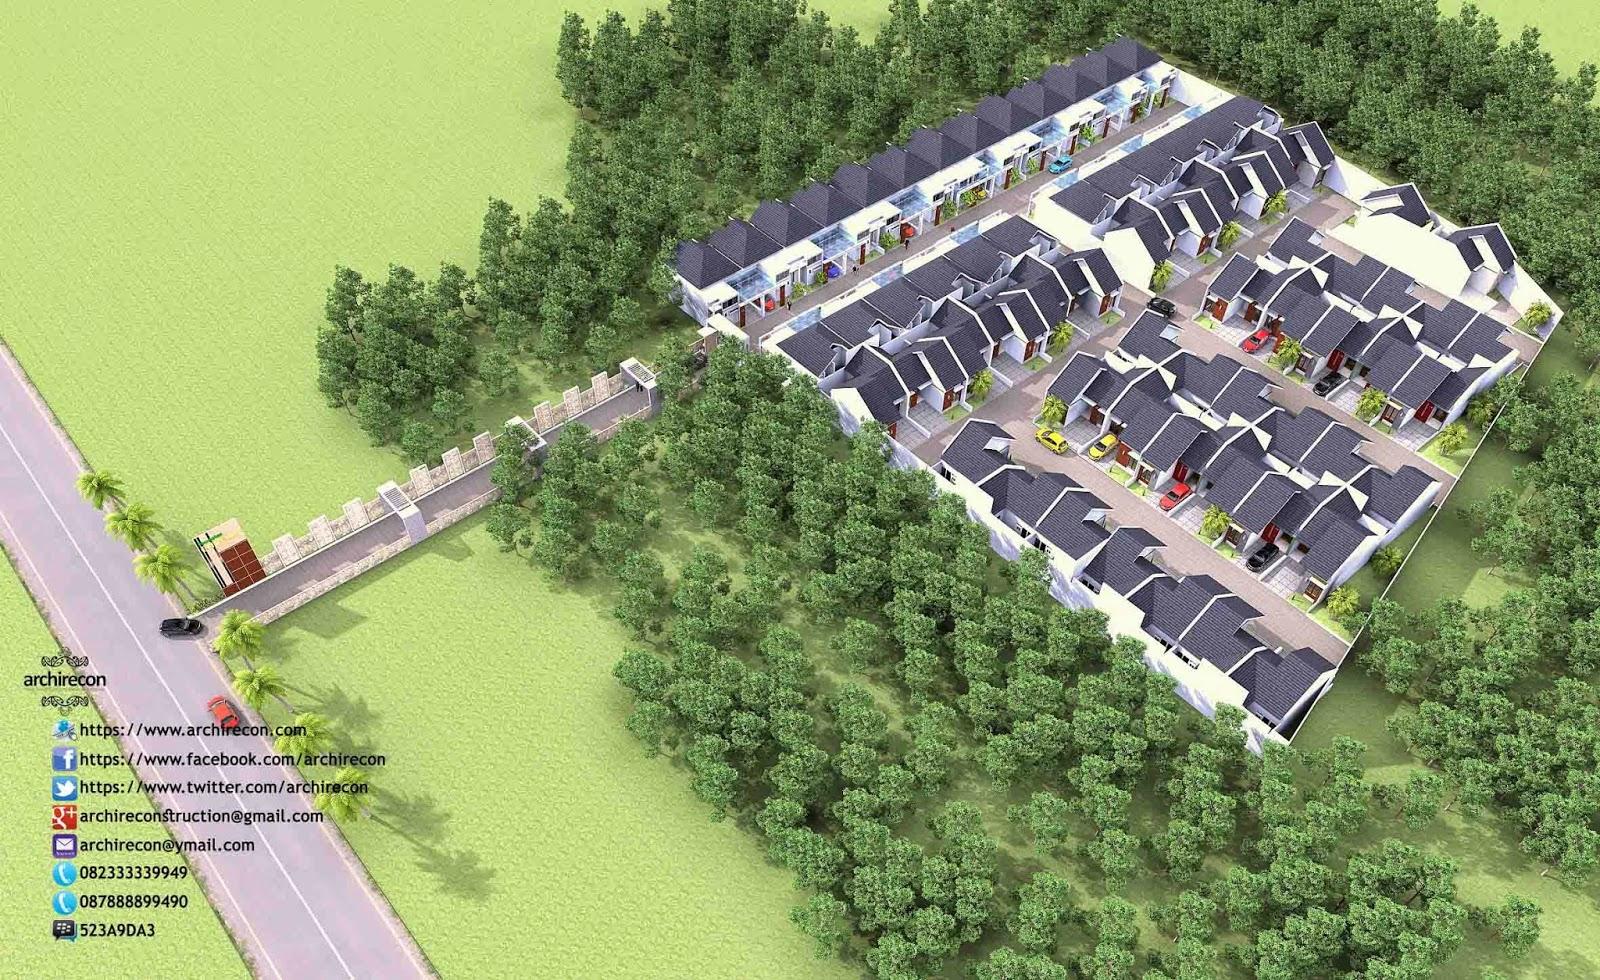 Desain Rumah Minimalis Perumahan Griya Mas Sidoarjo - 3D Kawasan